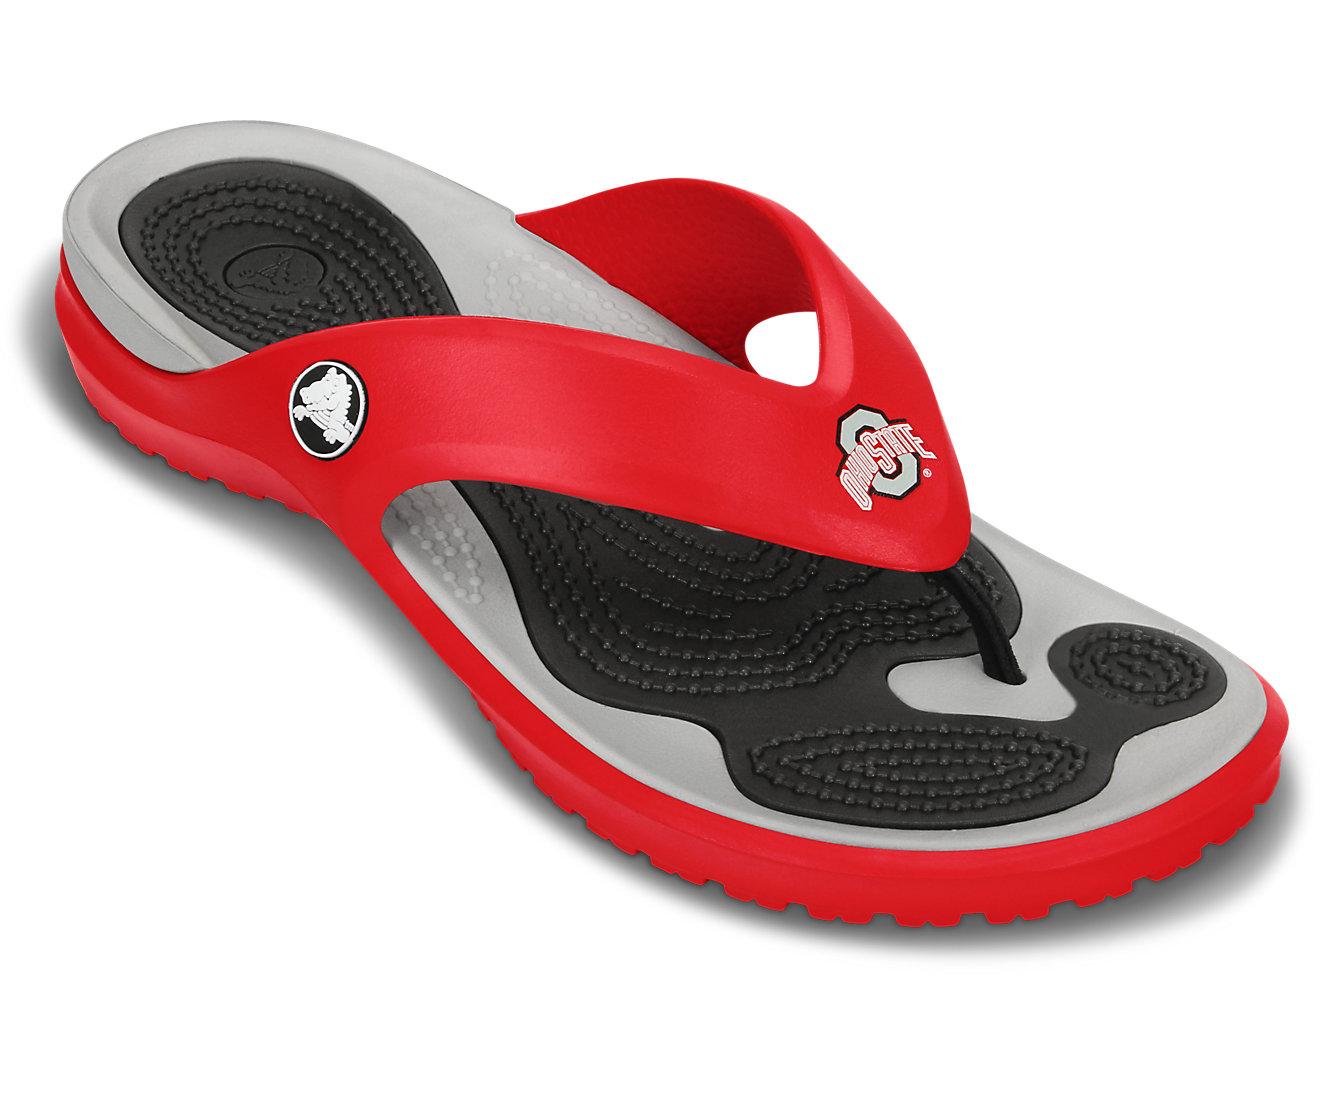 Flip Flop Crocs | Modi Flip Crocs | Crocs Modi Flip Flop